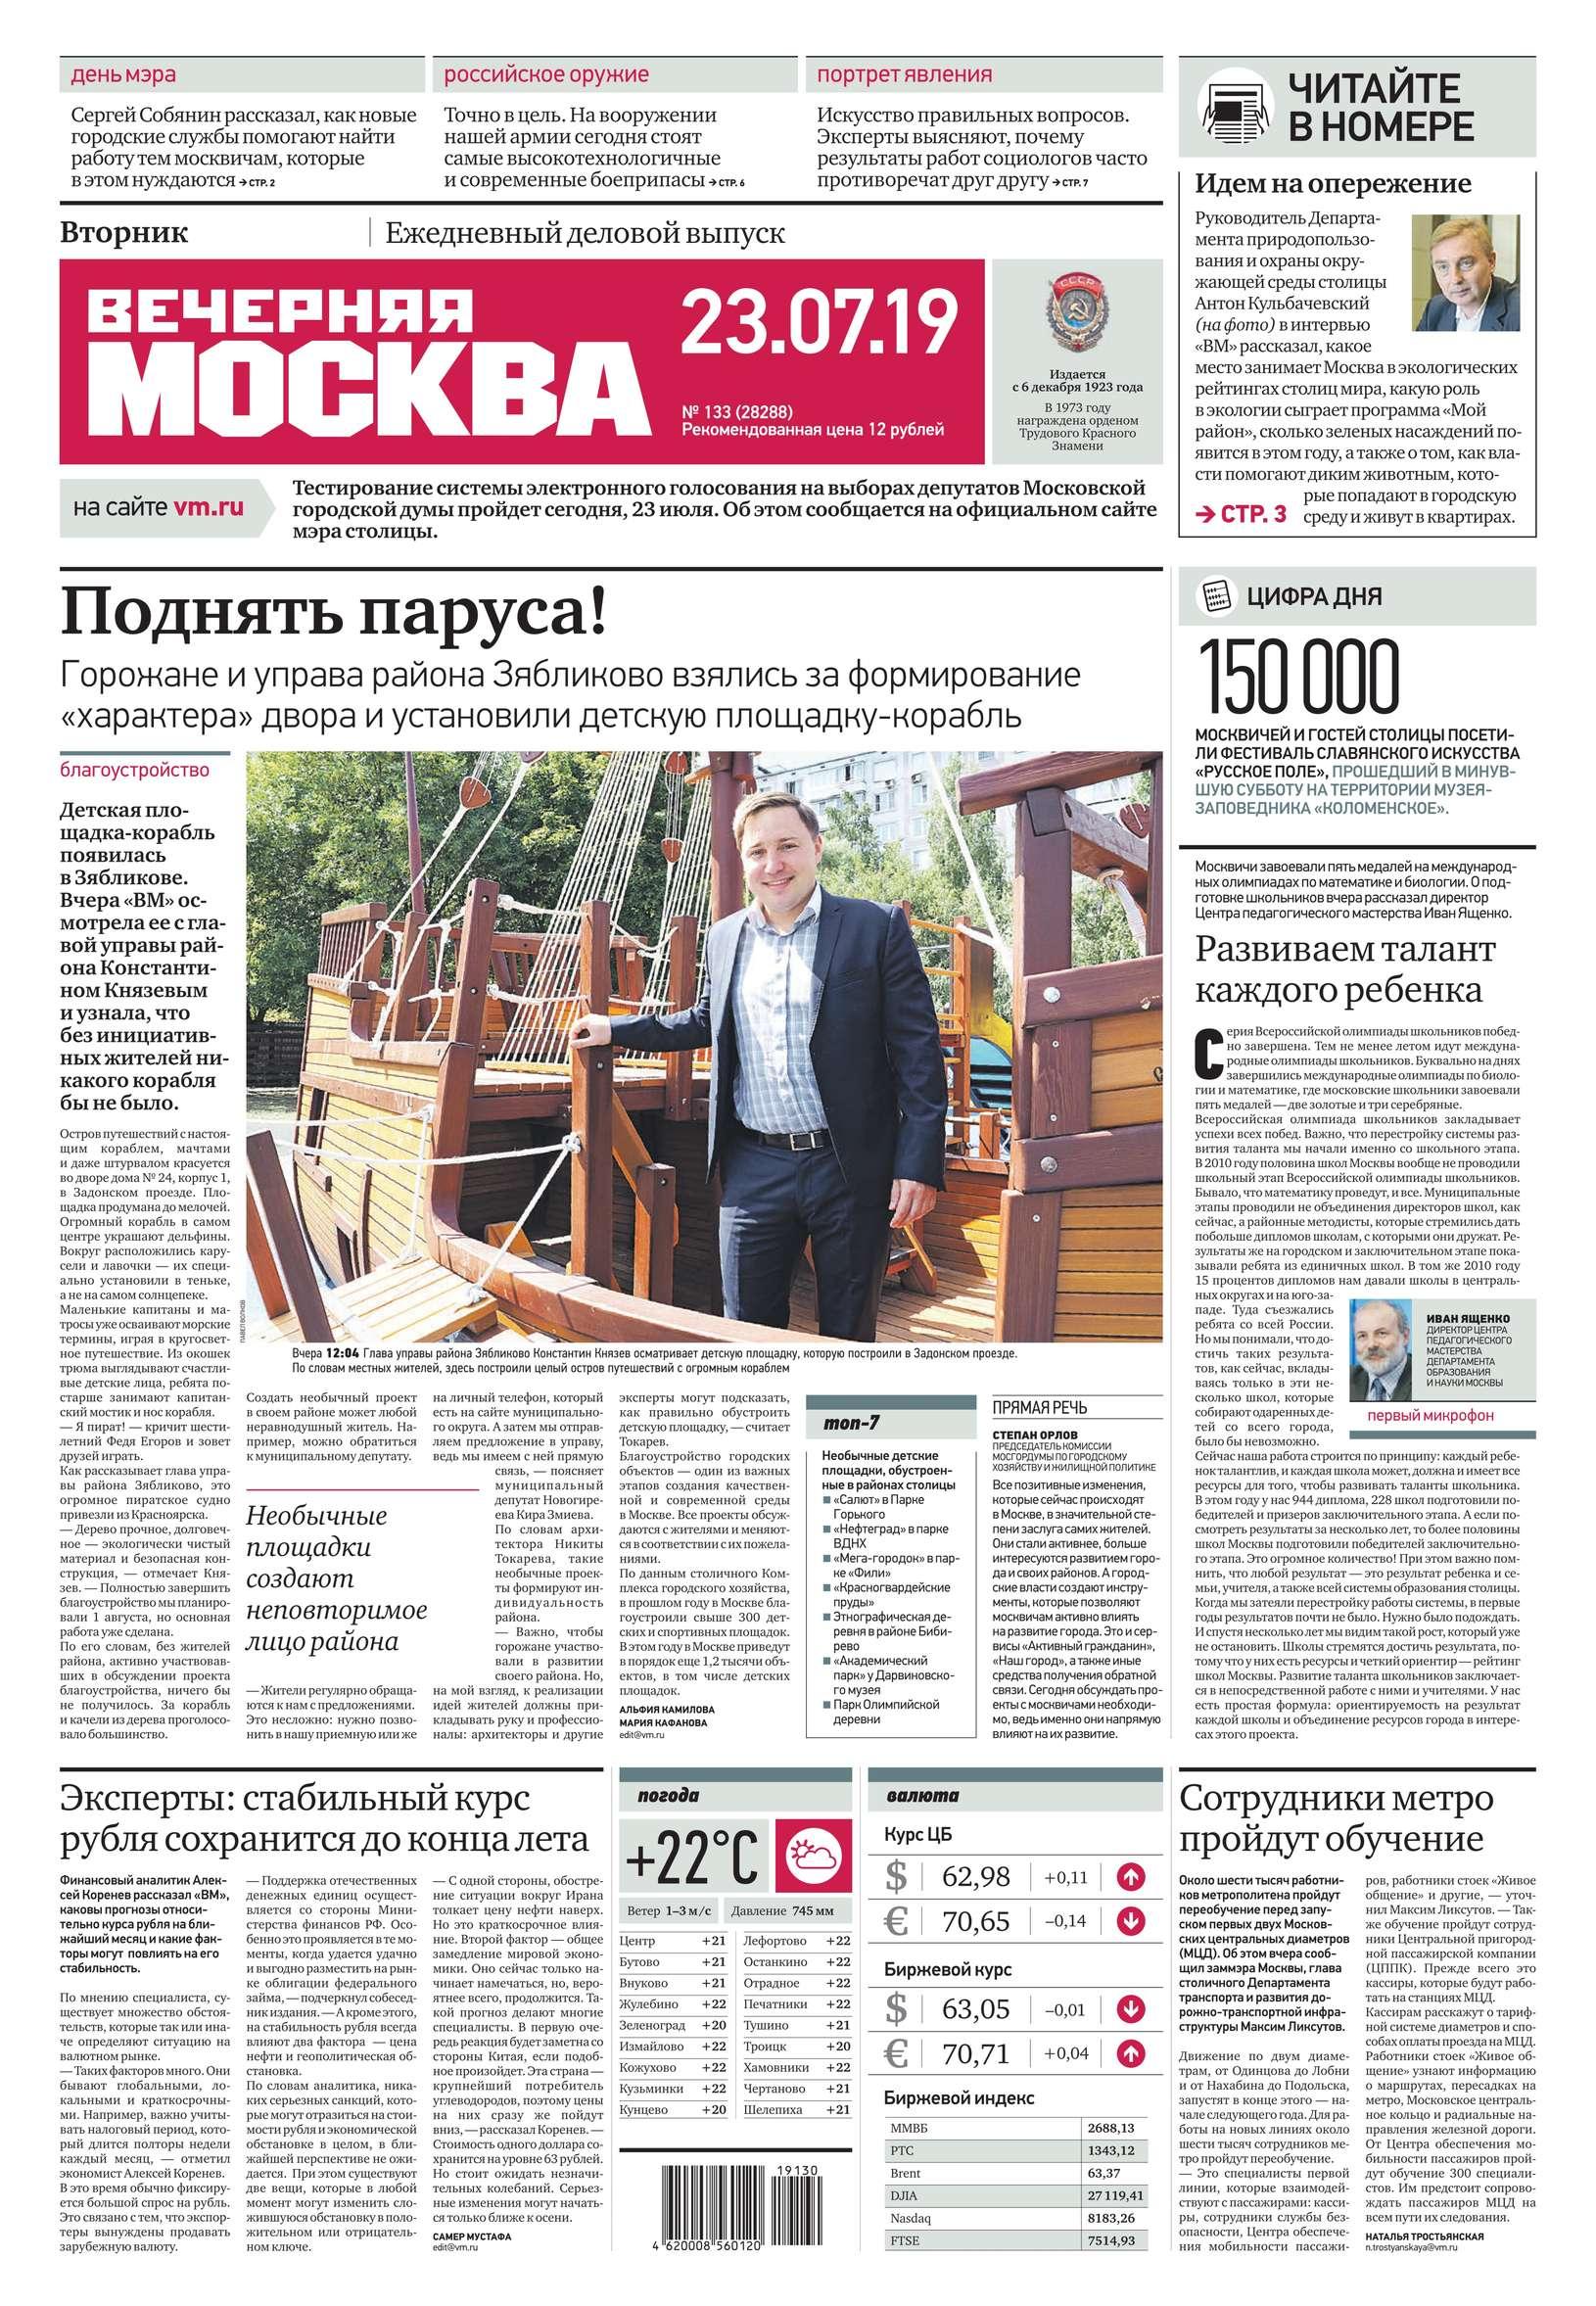 Редакция газеты Вечерняя Москва Вечерняя Москва 133-2019 jools holland cardiff